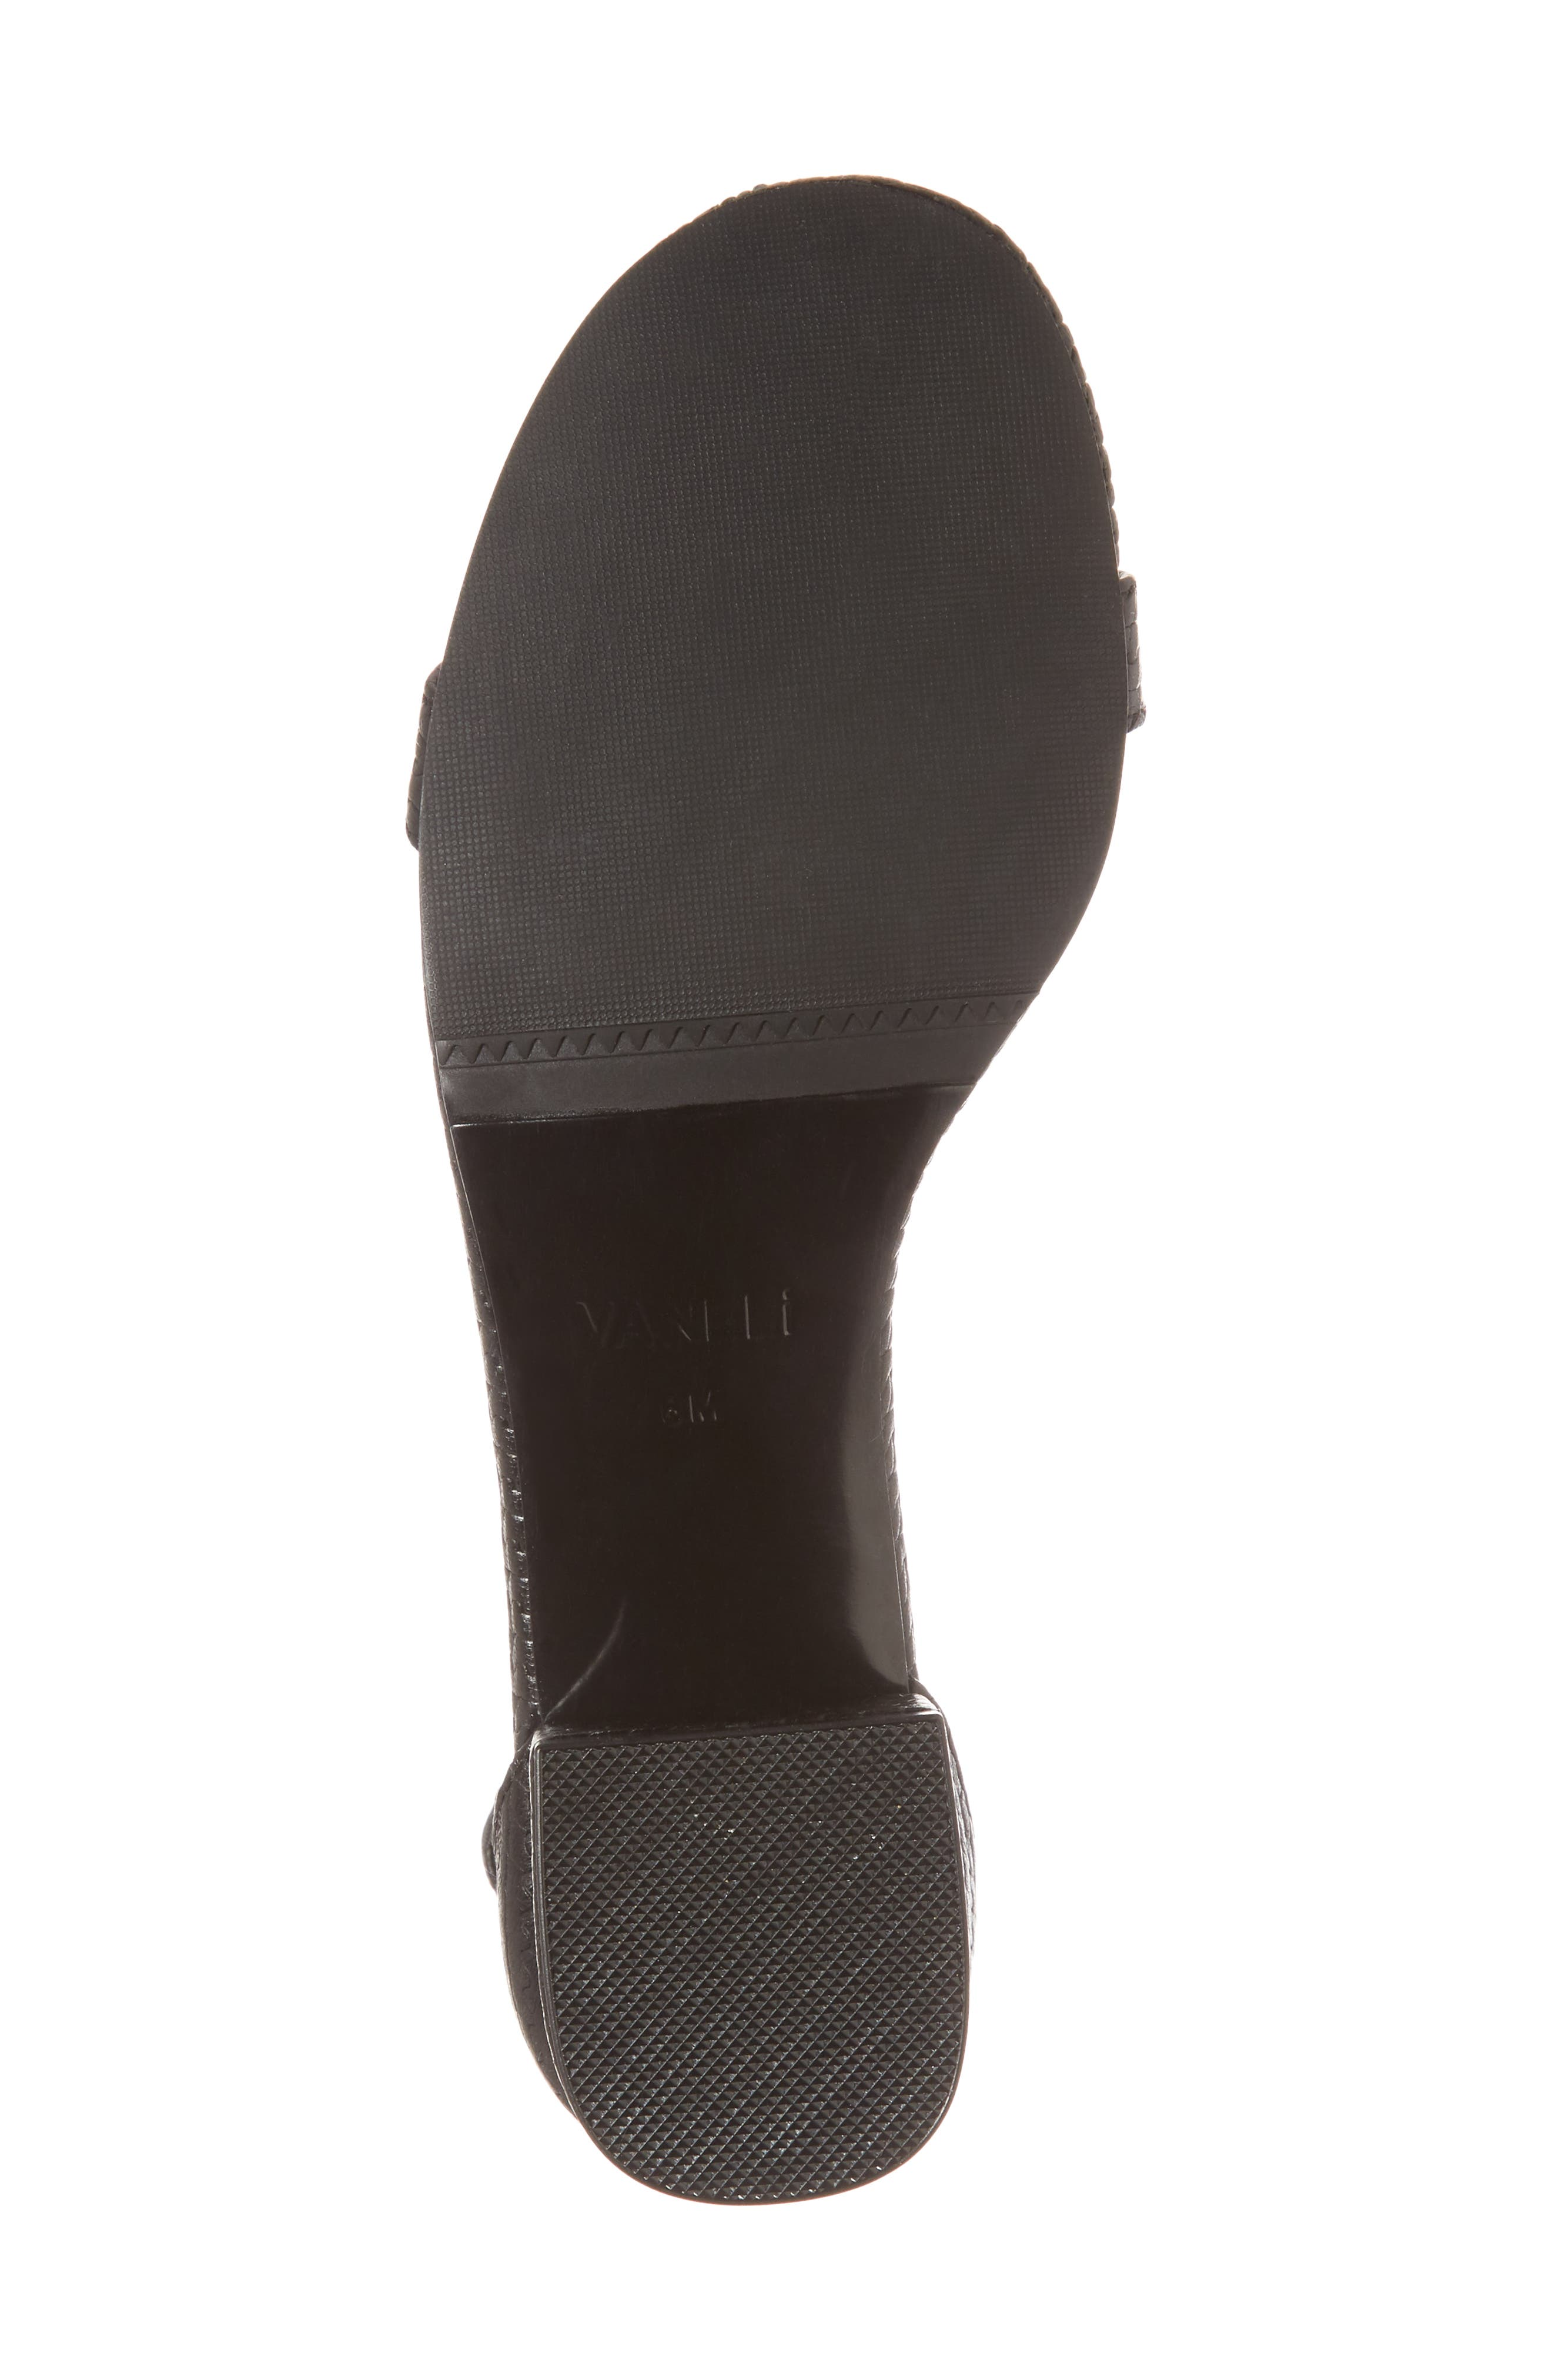 Hirin Sandal,                             Alternate thumbnail 6, color,                             Black Printed Leather